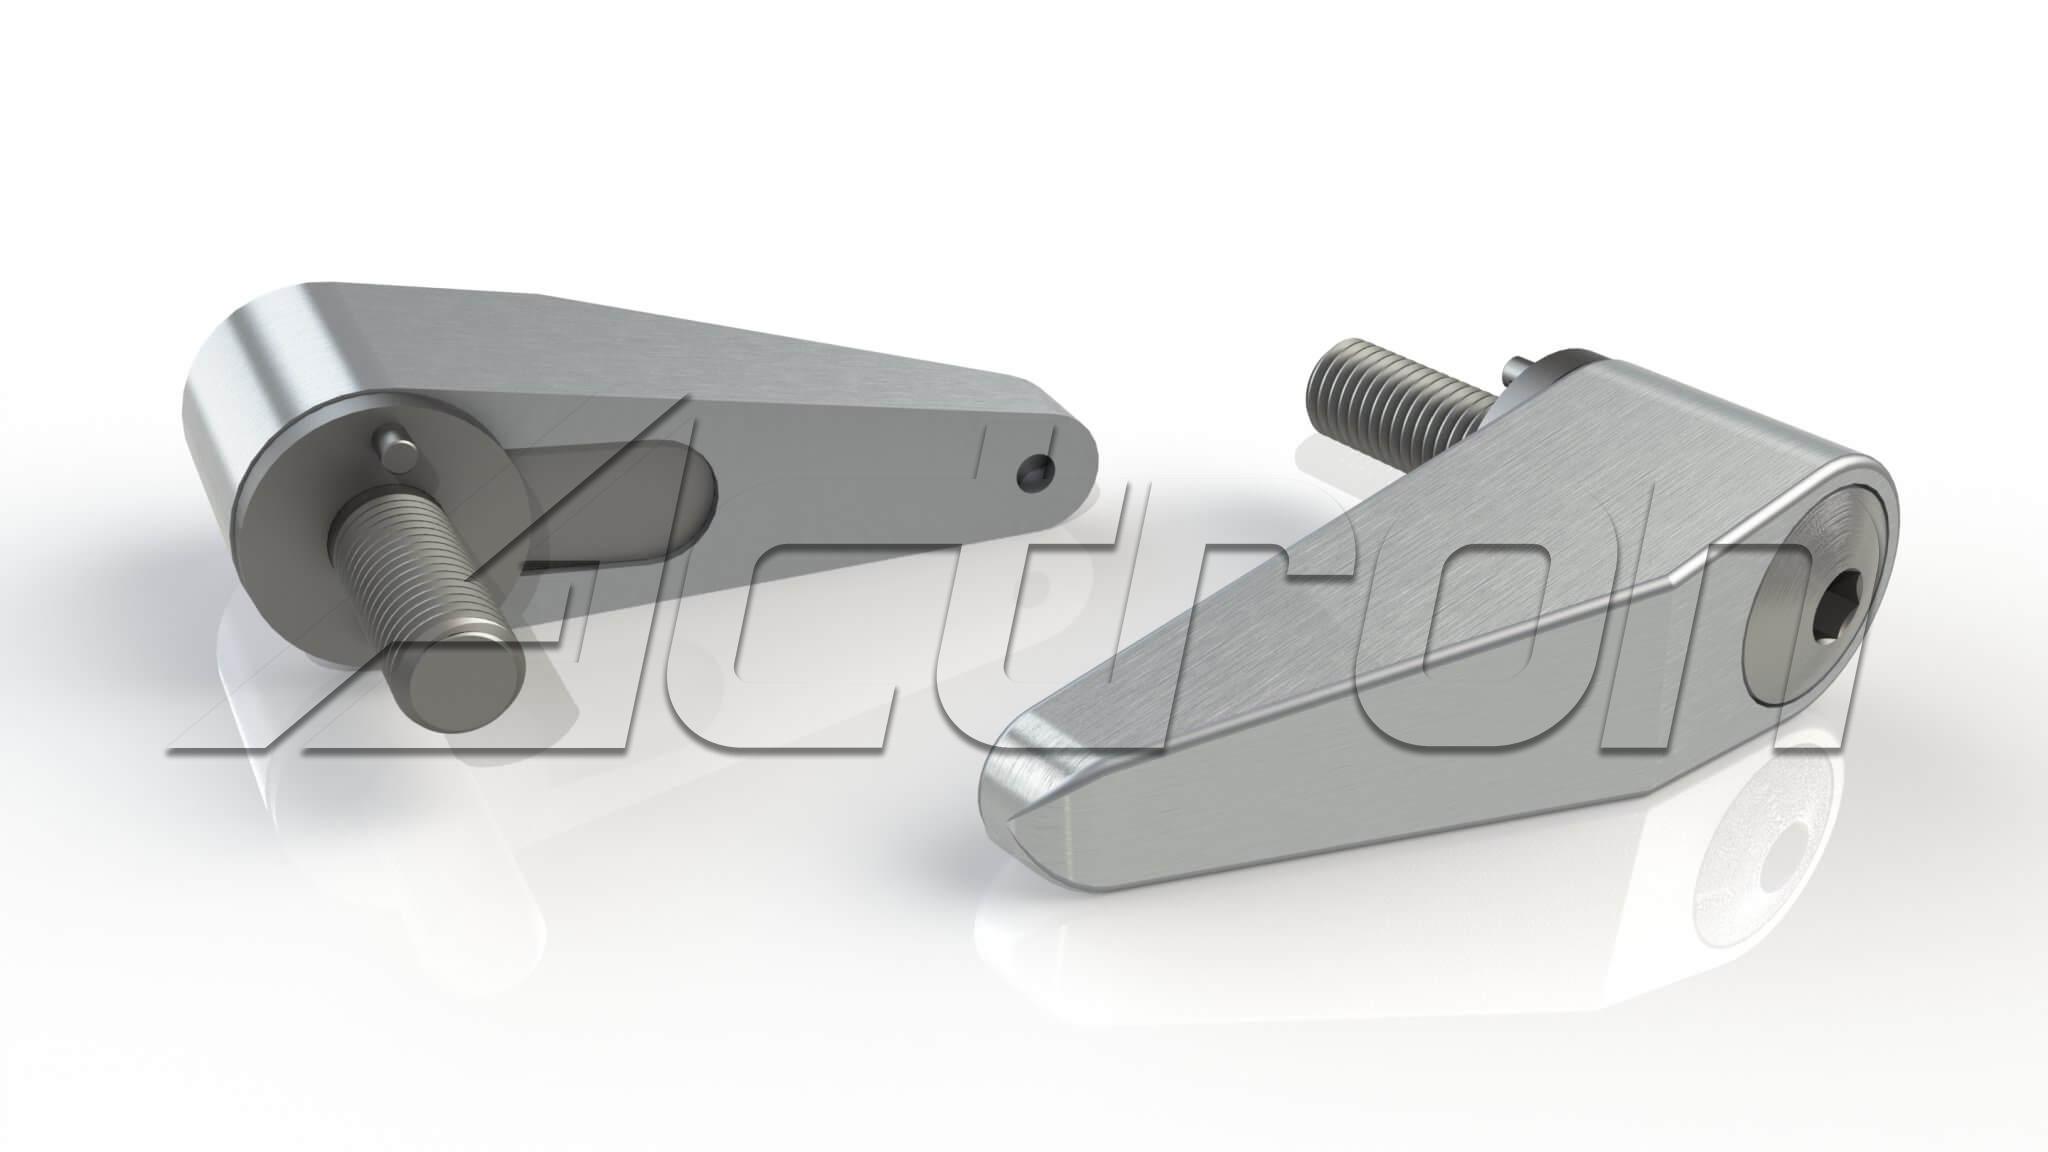 1-4-turn-retainer-5532-a35677.jpg